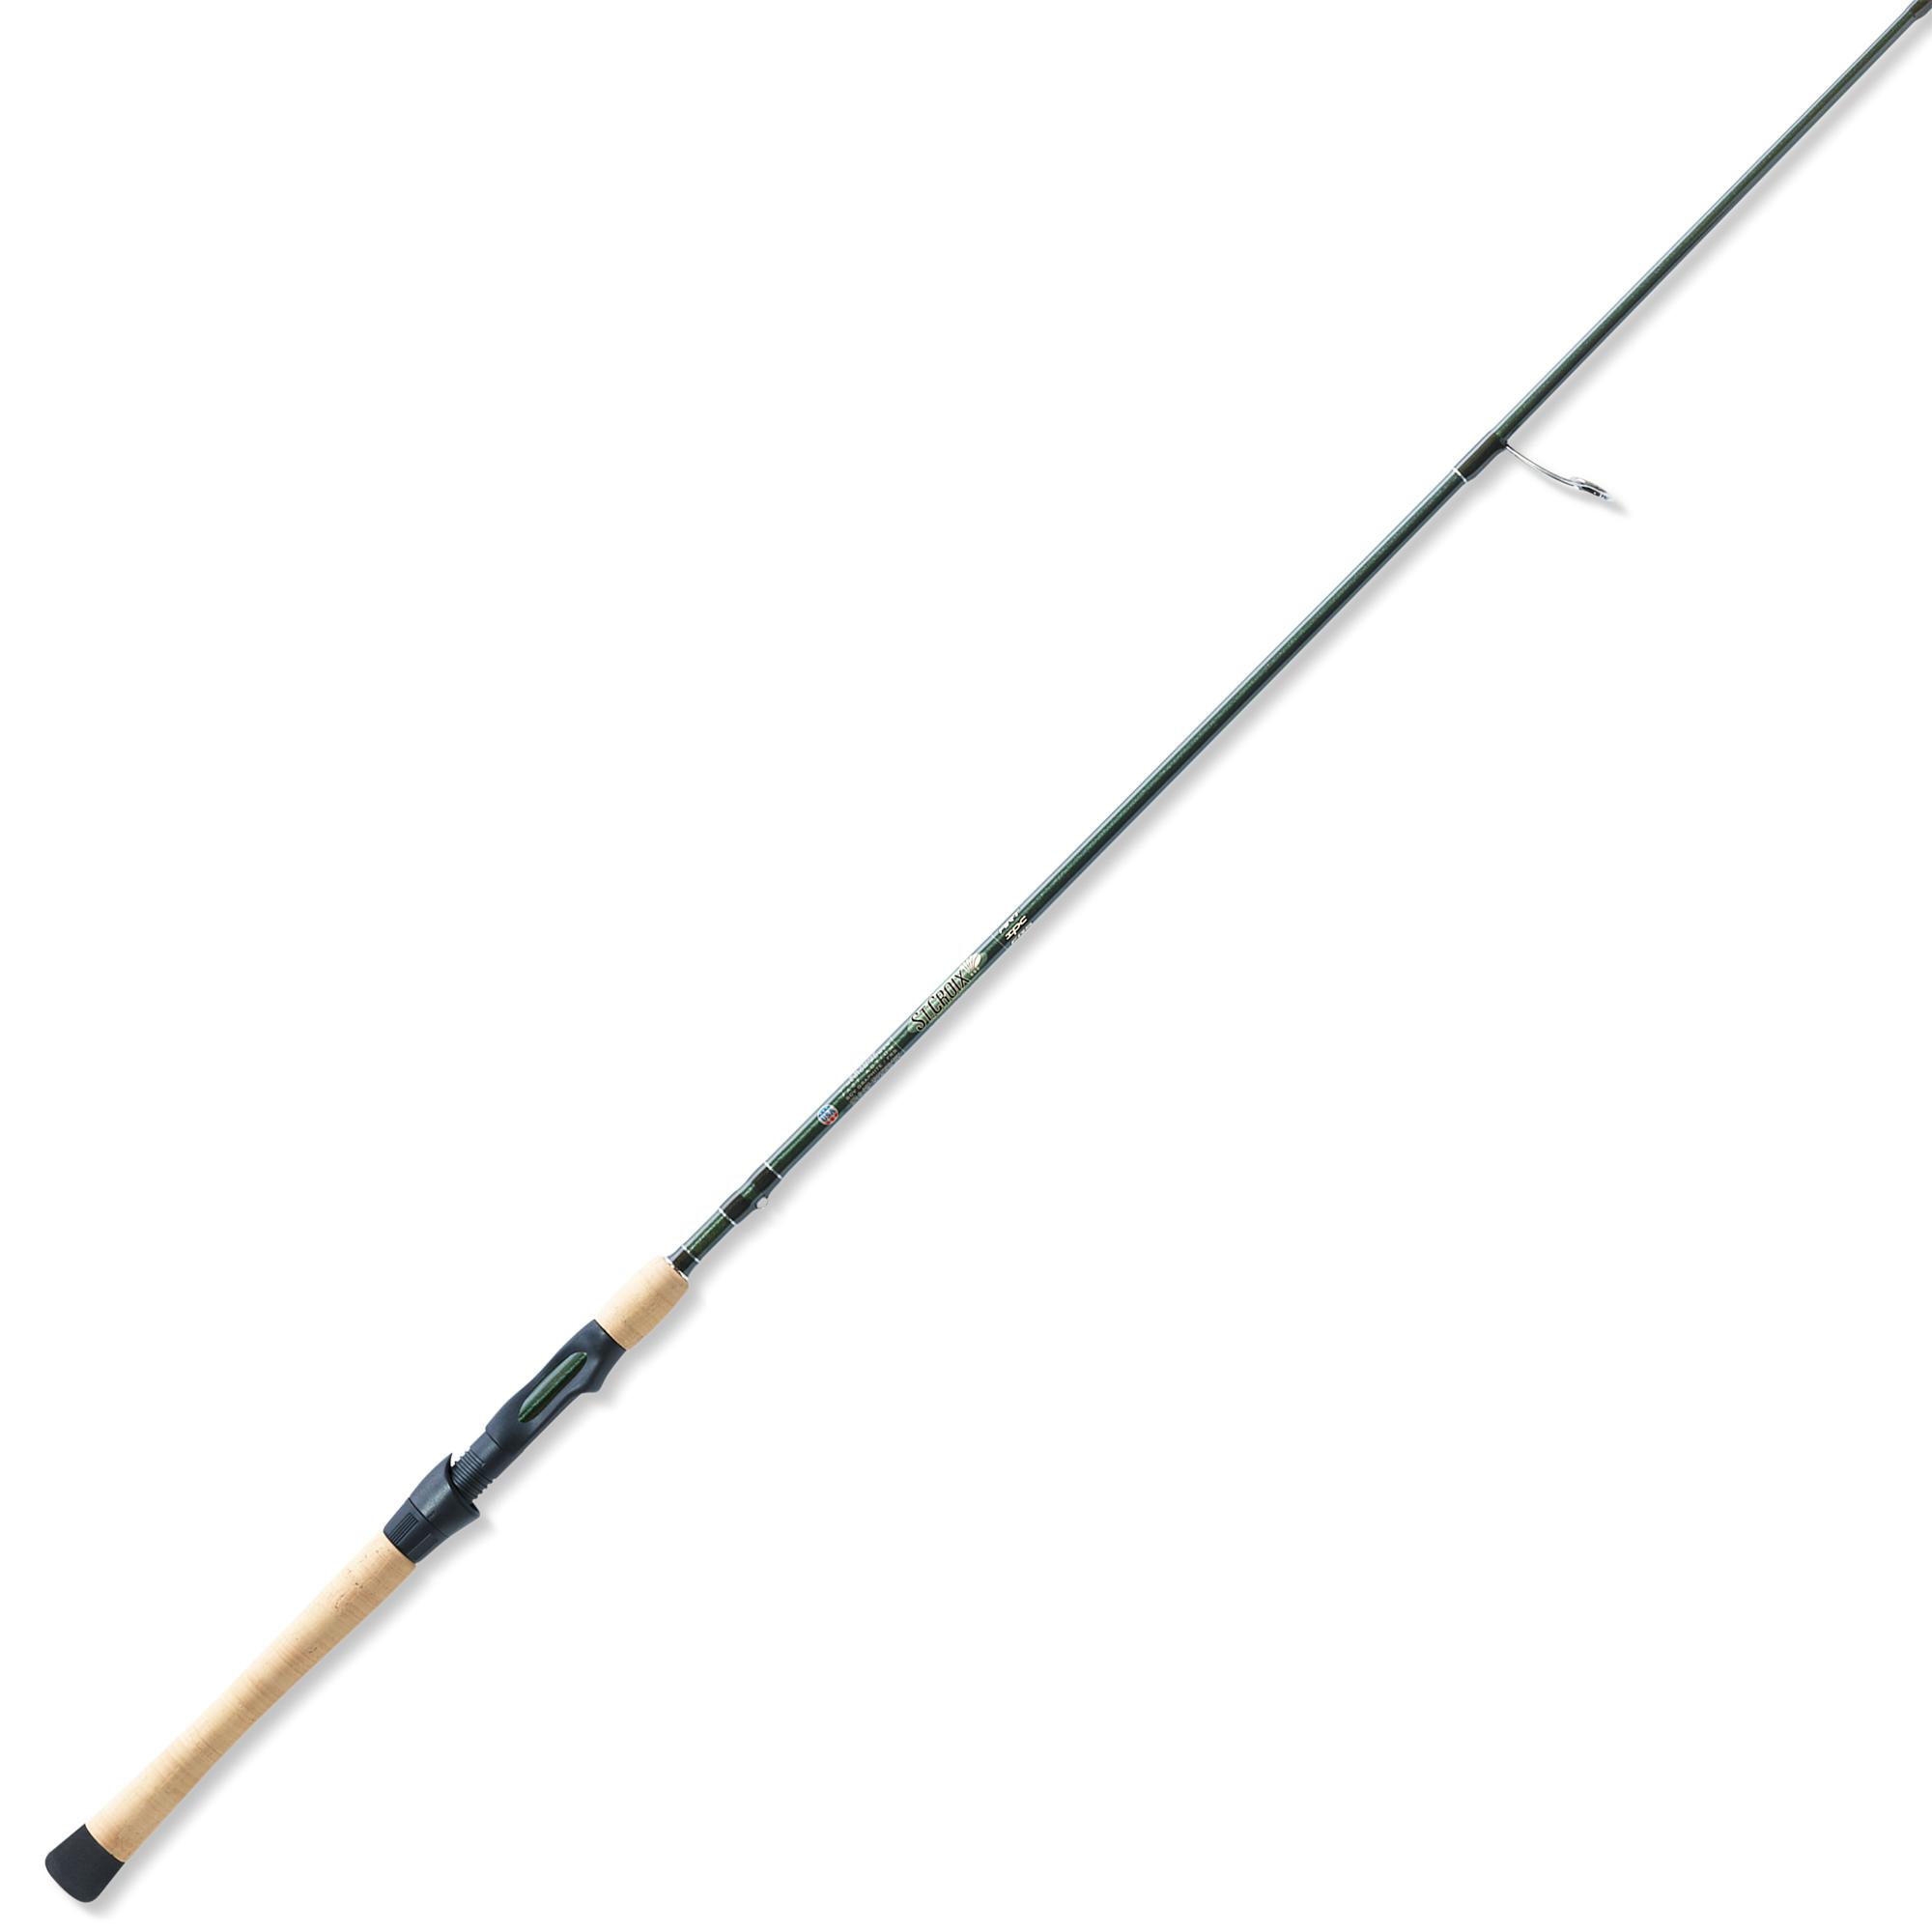 St. Croix Legend Elite Spinning Rod